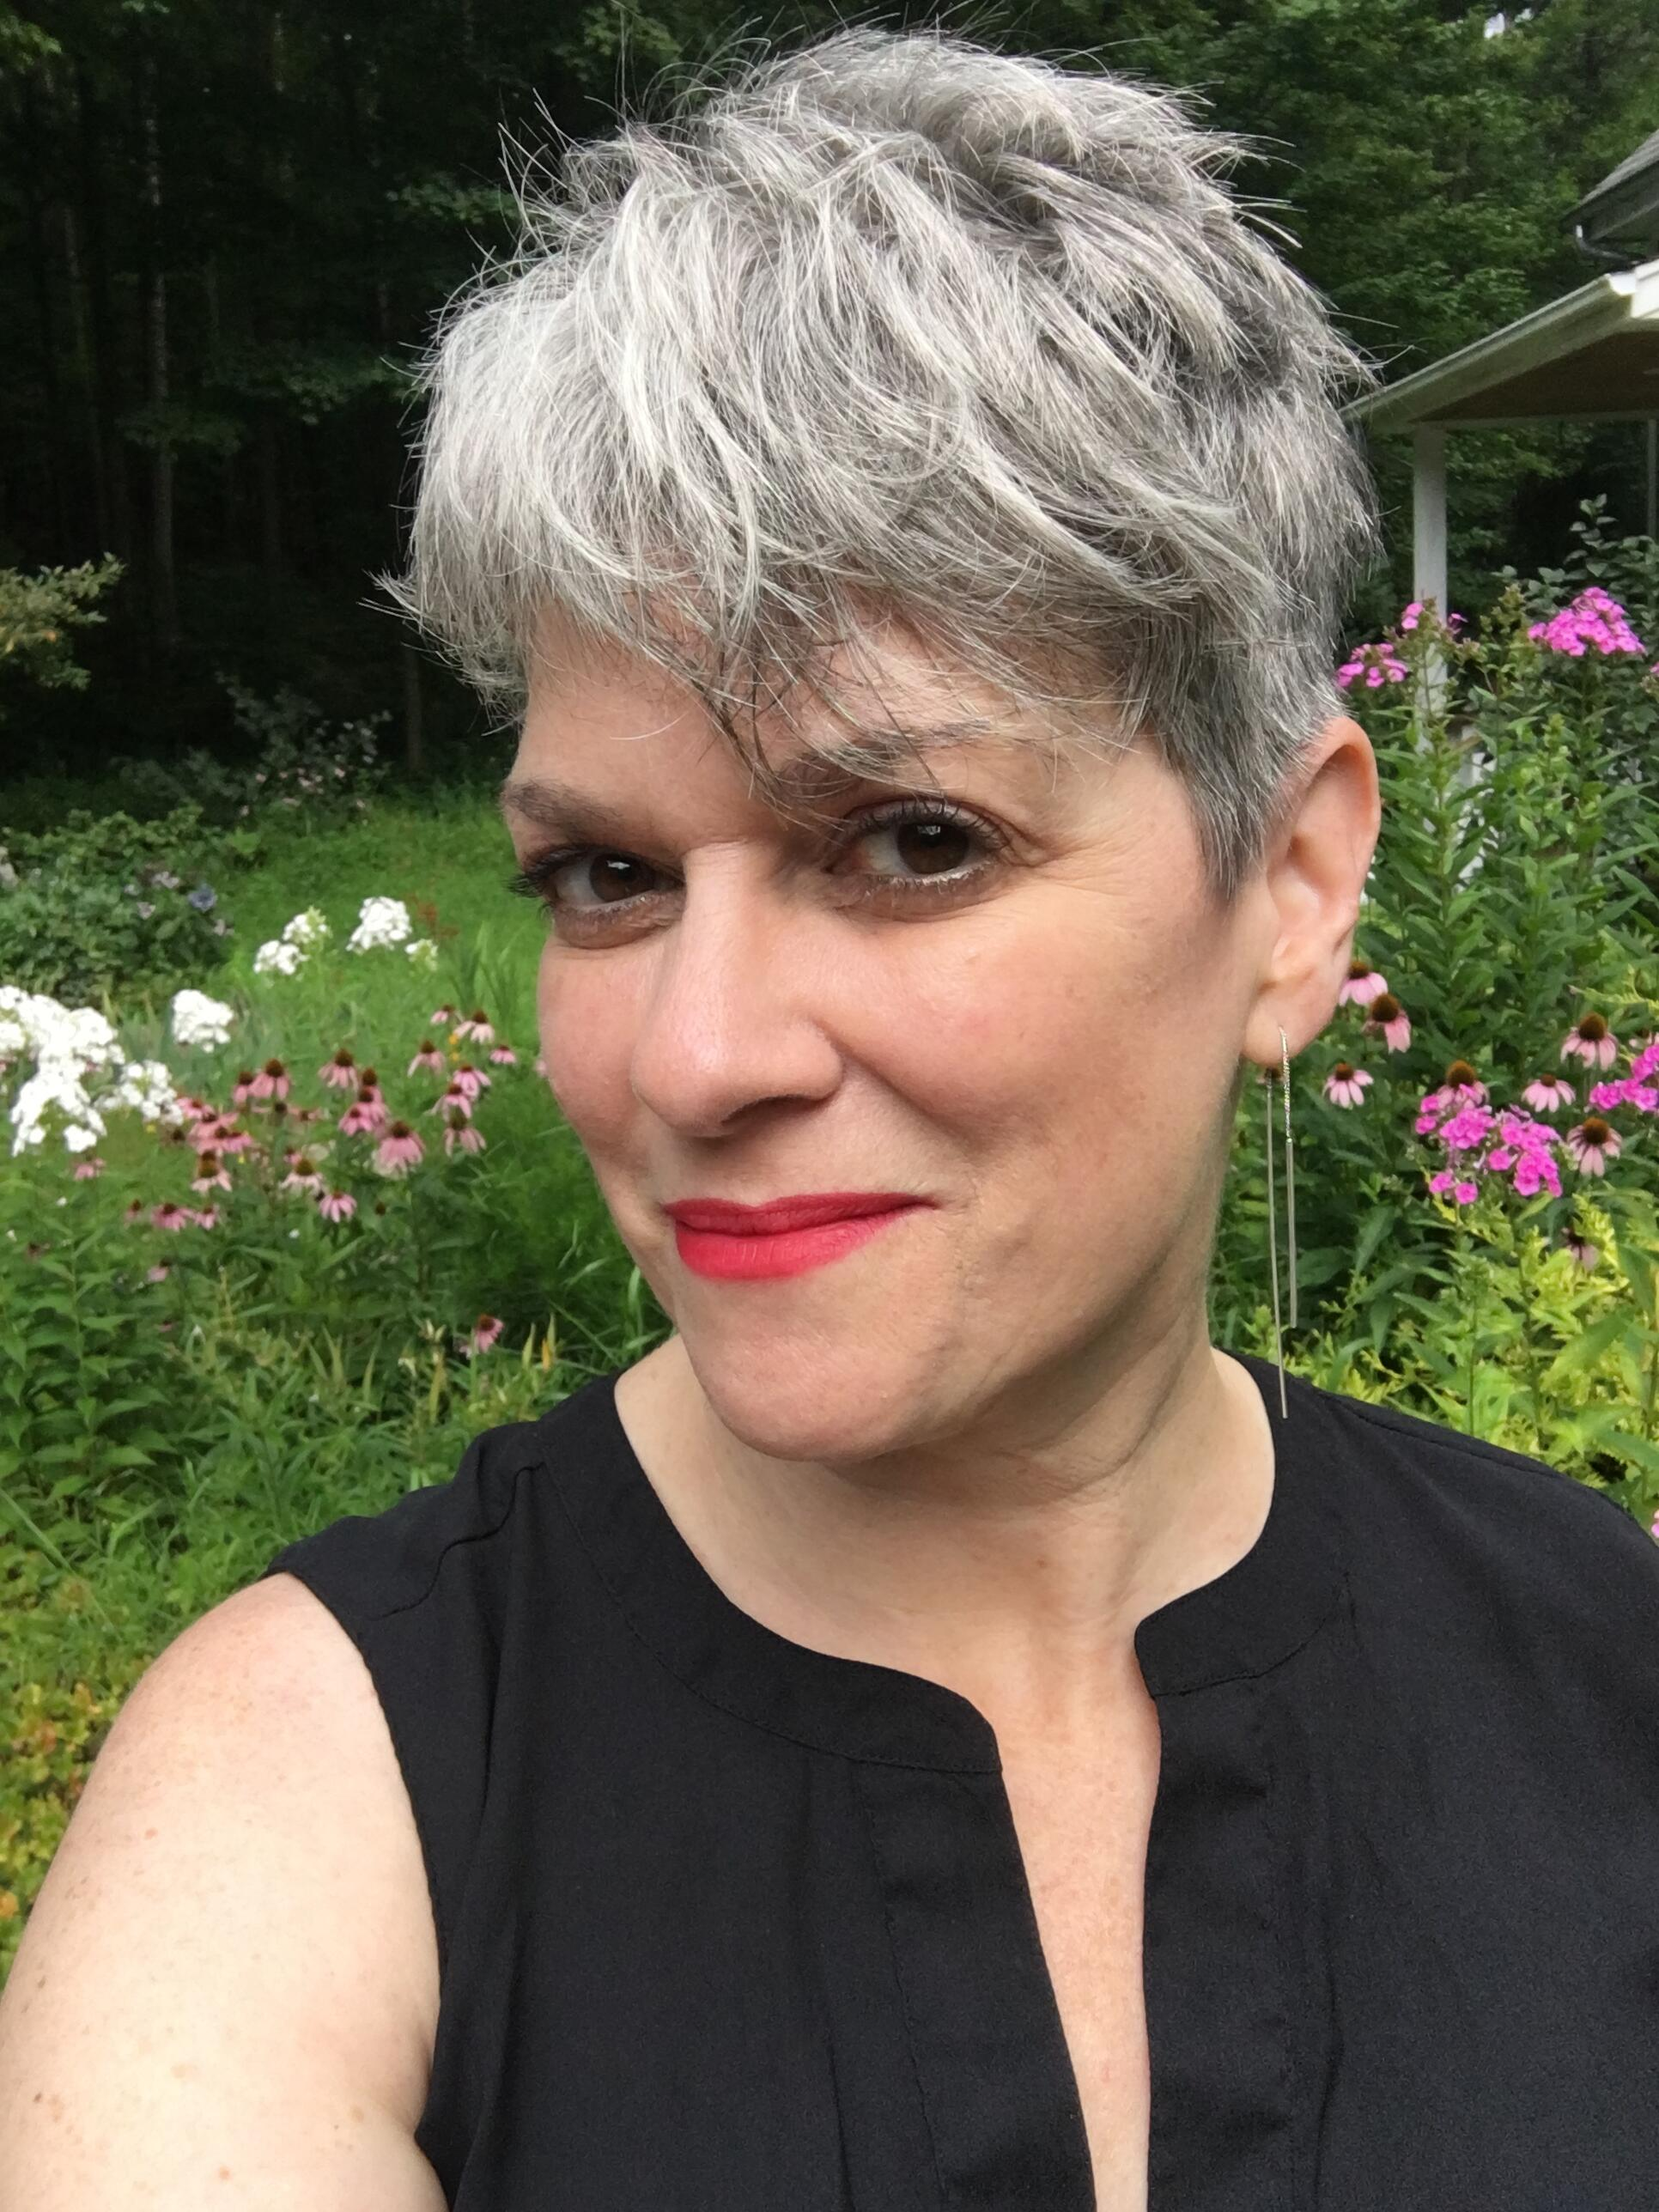 Author Kristan Higgins gray hair